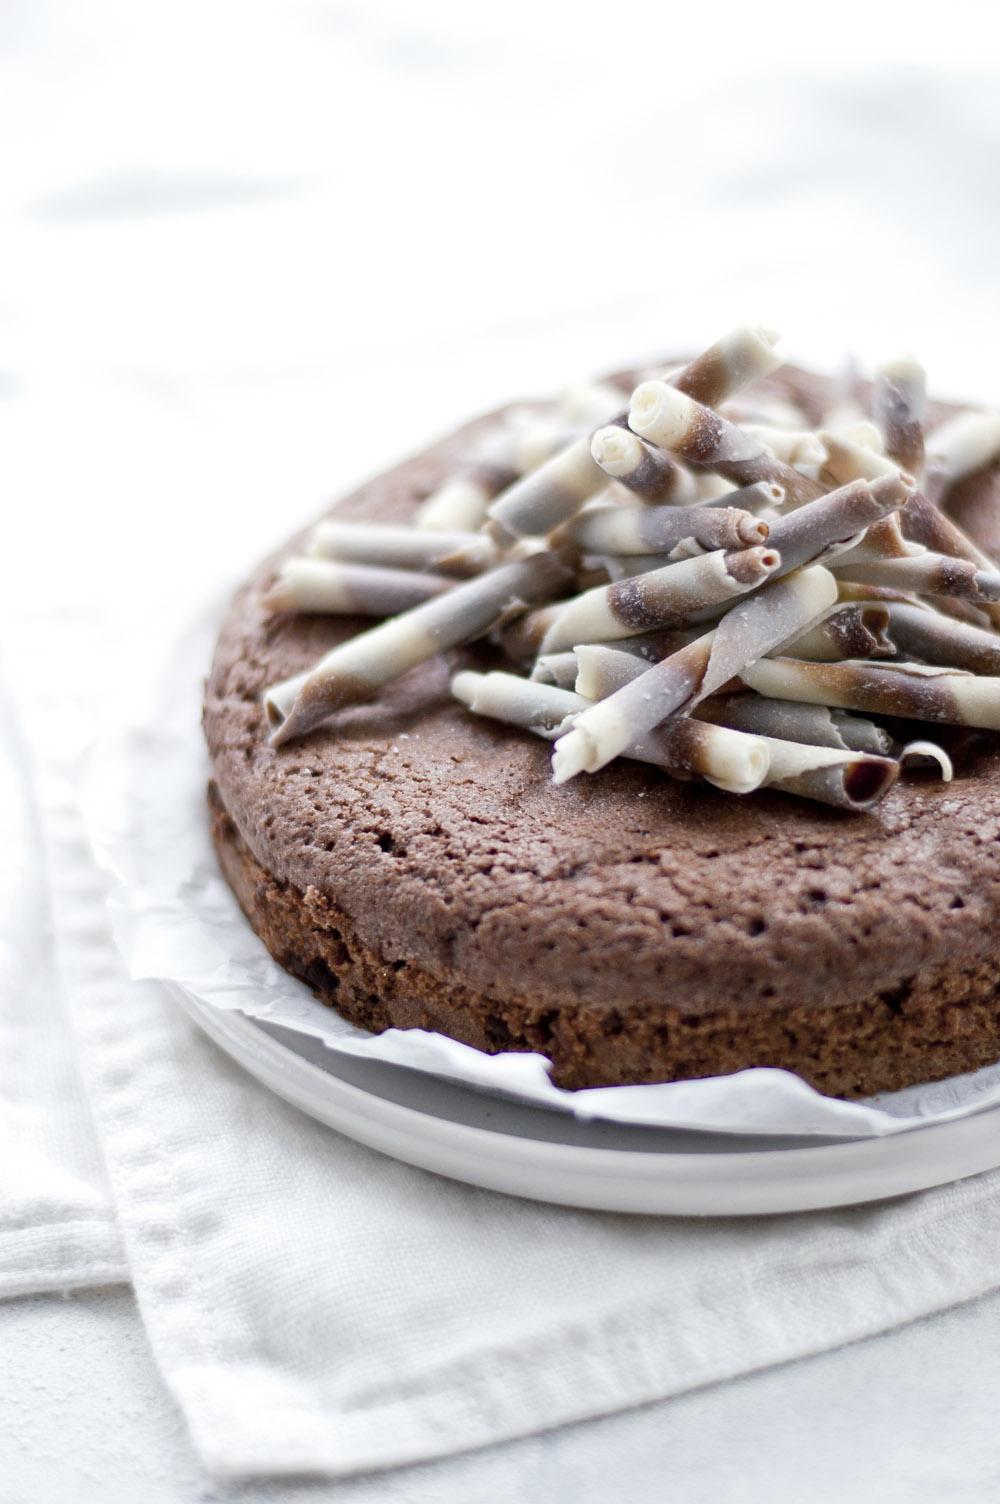 Copenhagen Cakes Copenhagencakes Chokoladekage